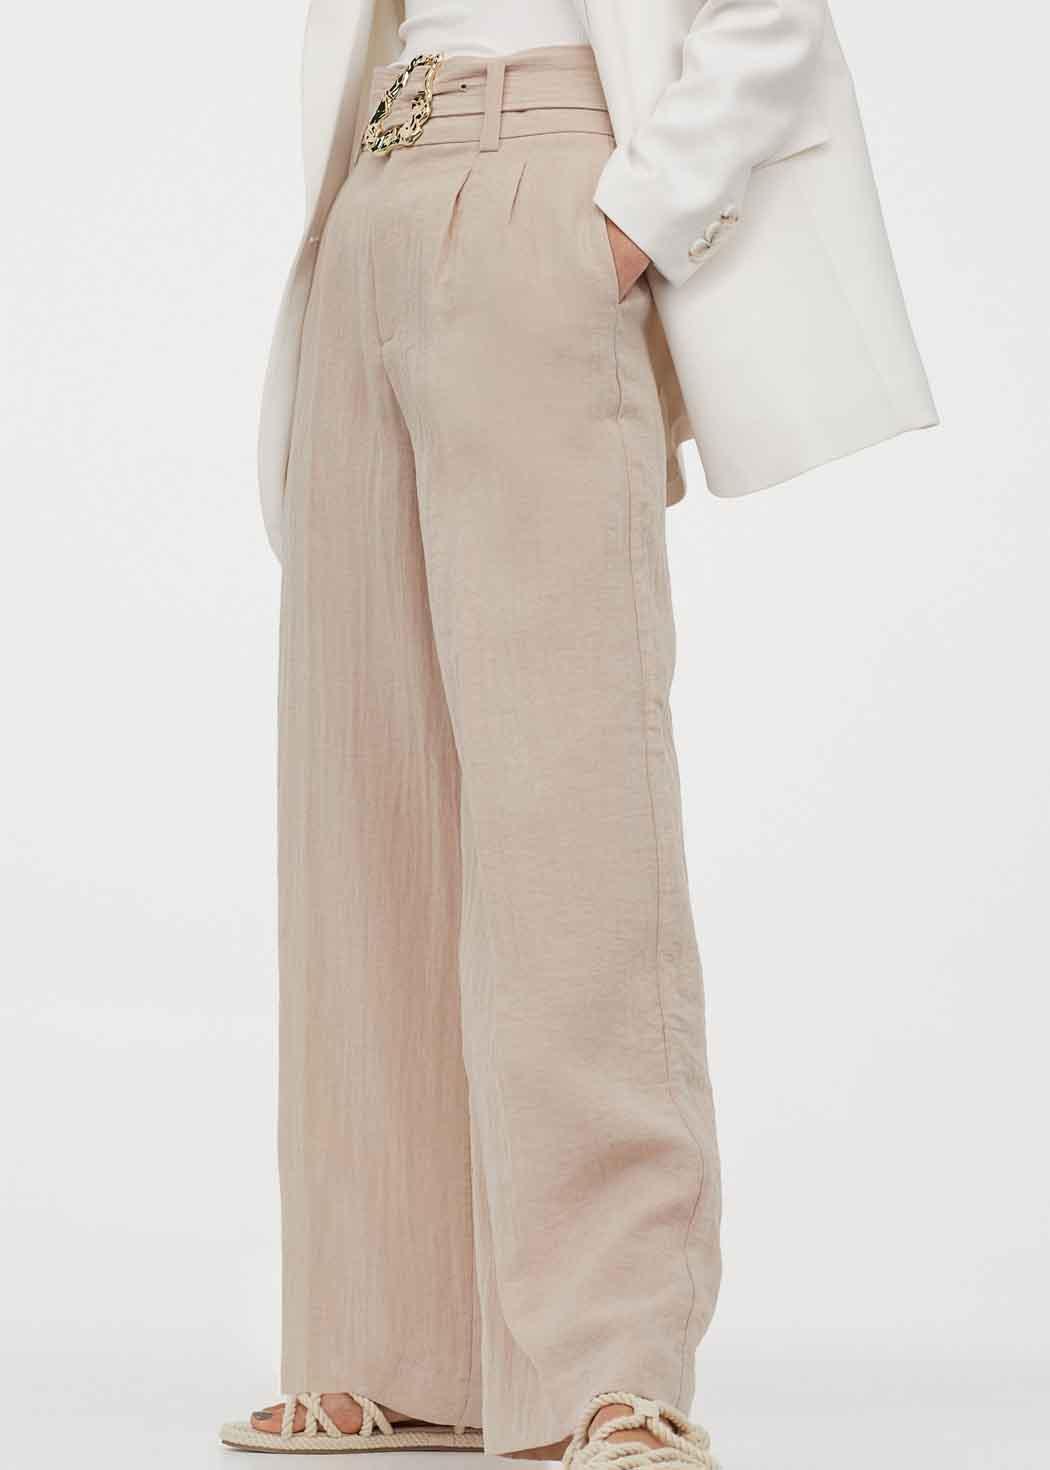 h&M beige trousers